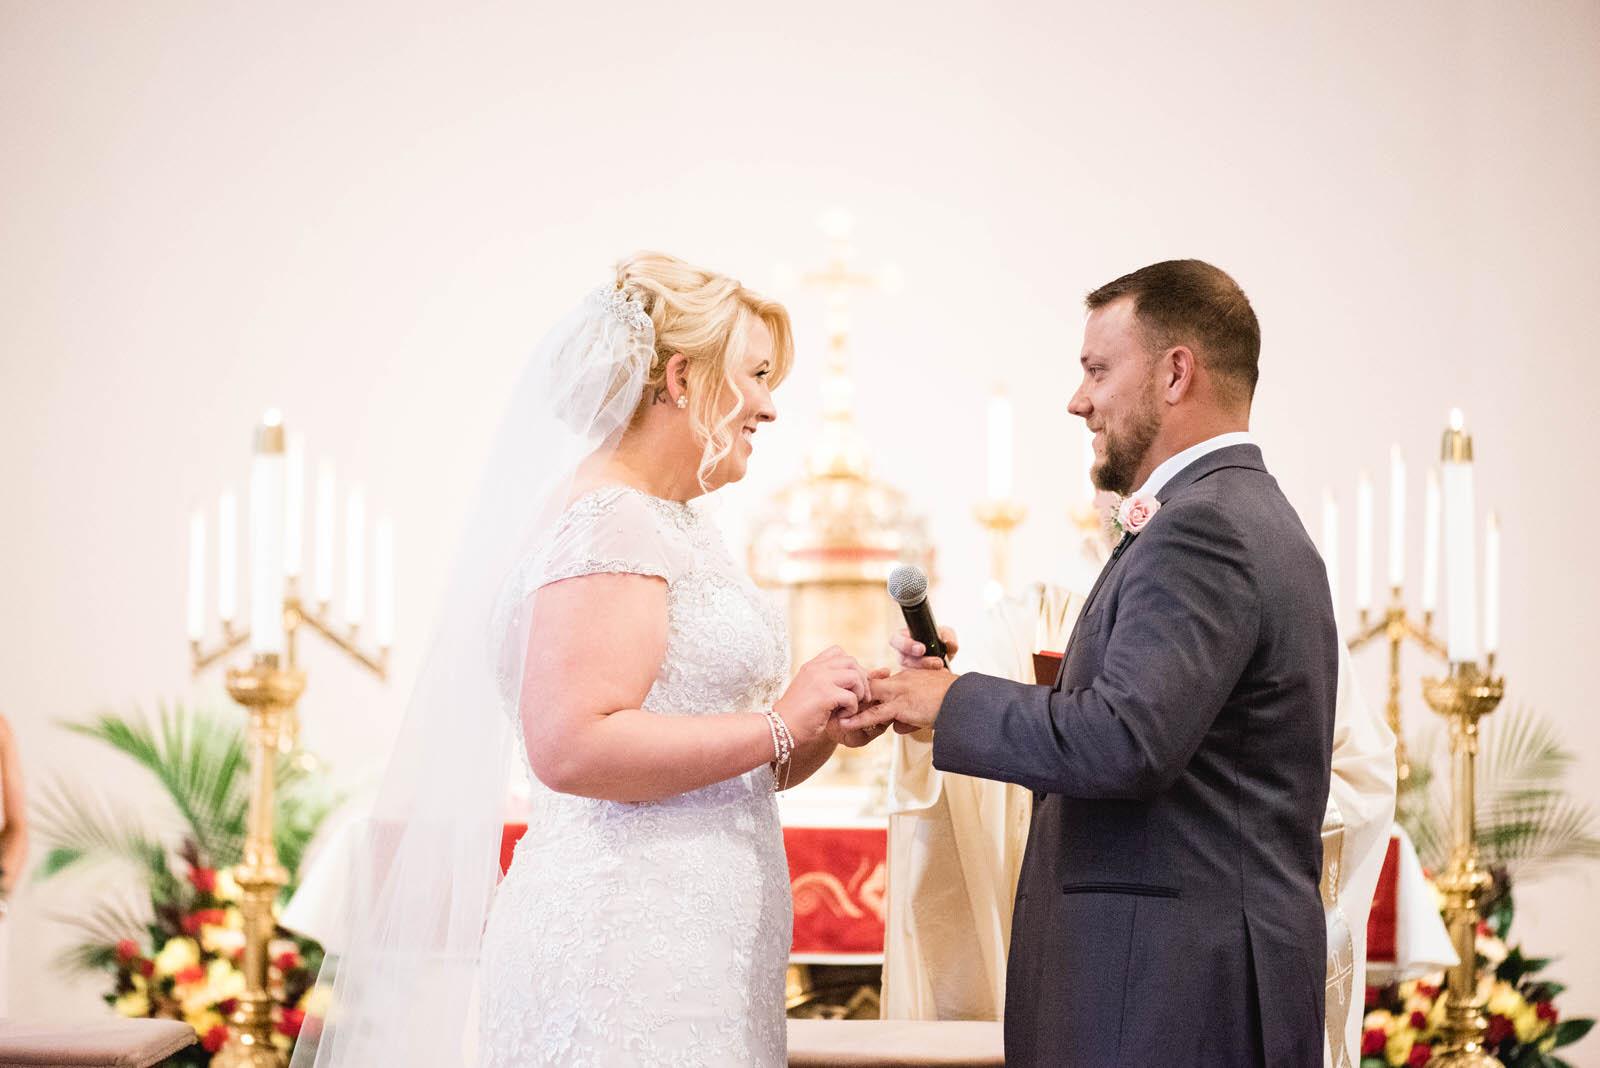 weddings-at-Holy-Cross-Greek-Orthodox-Church-and-Hall-49.jpg